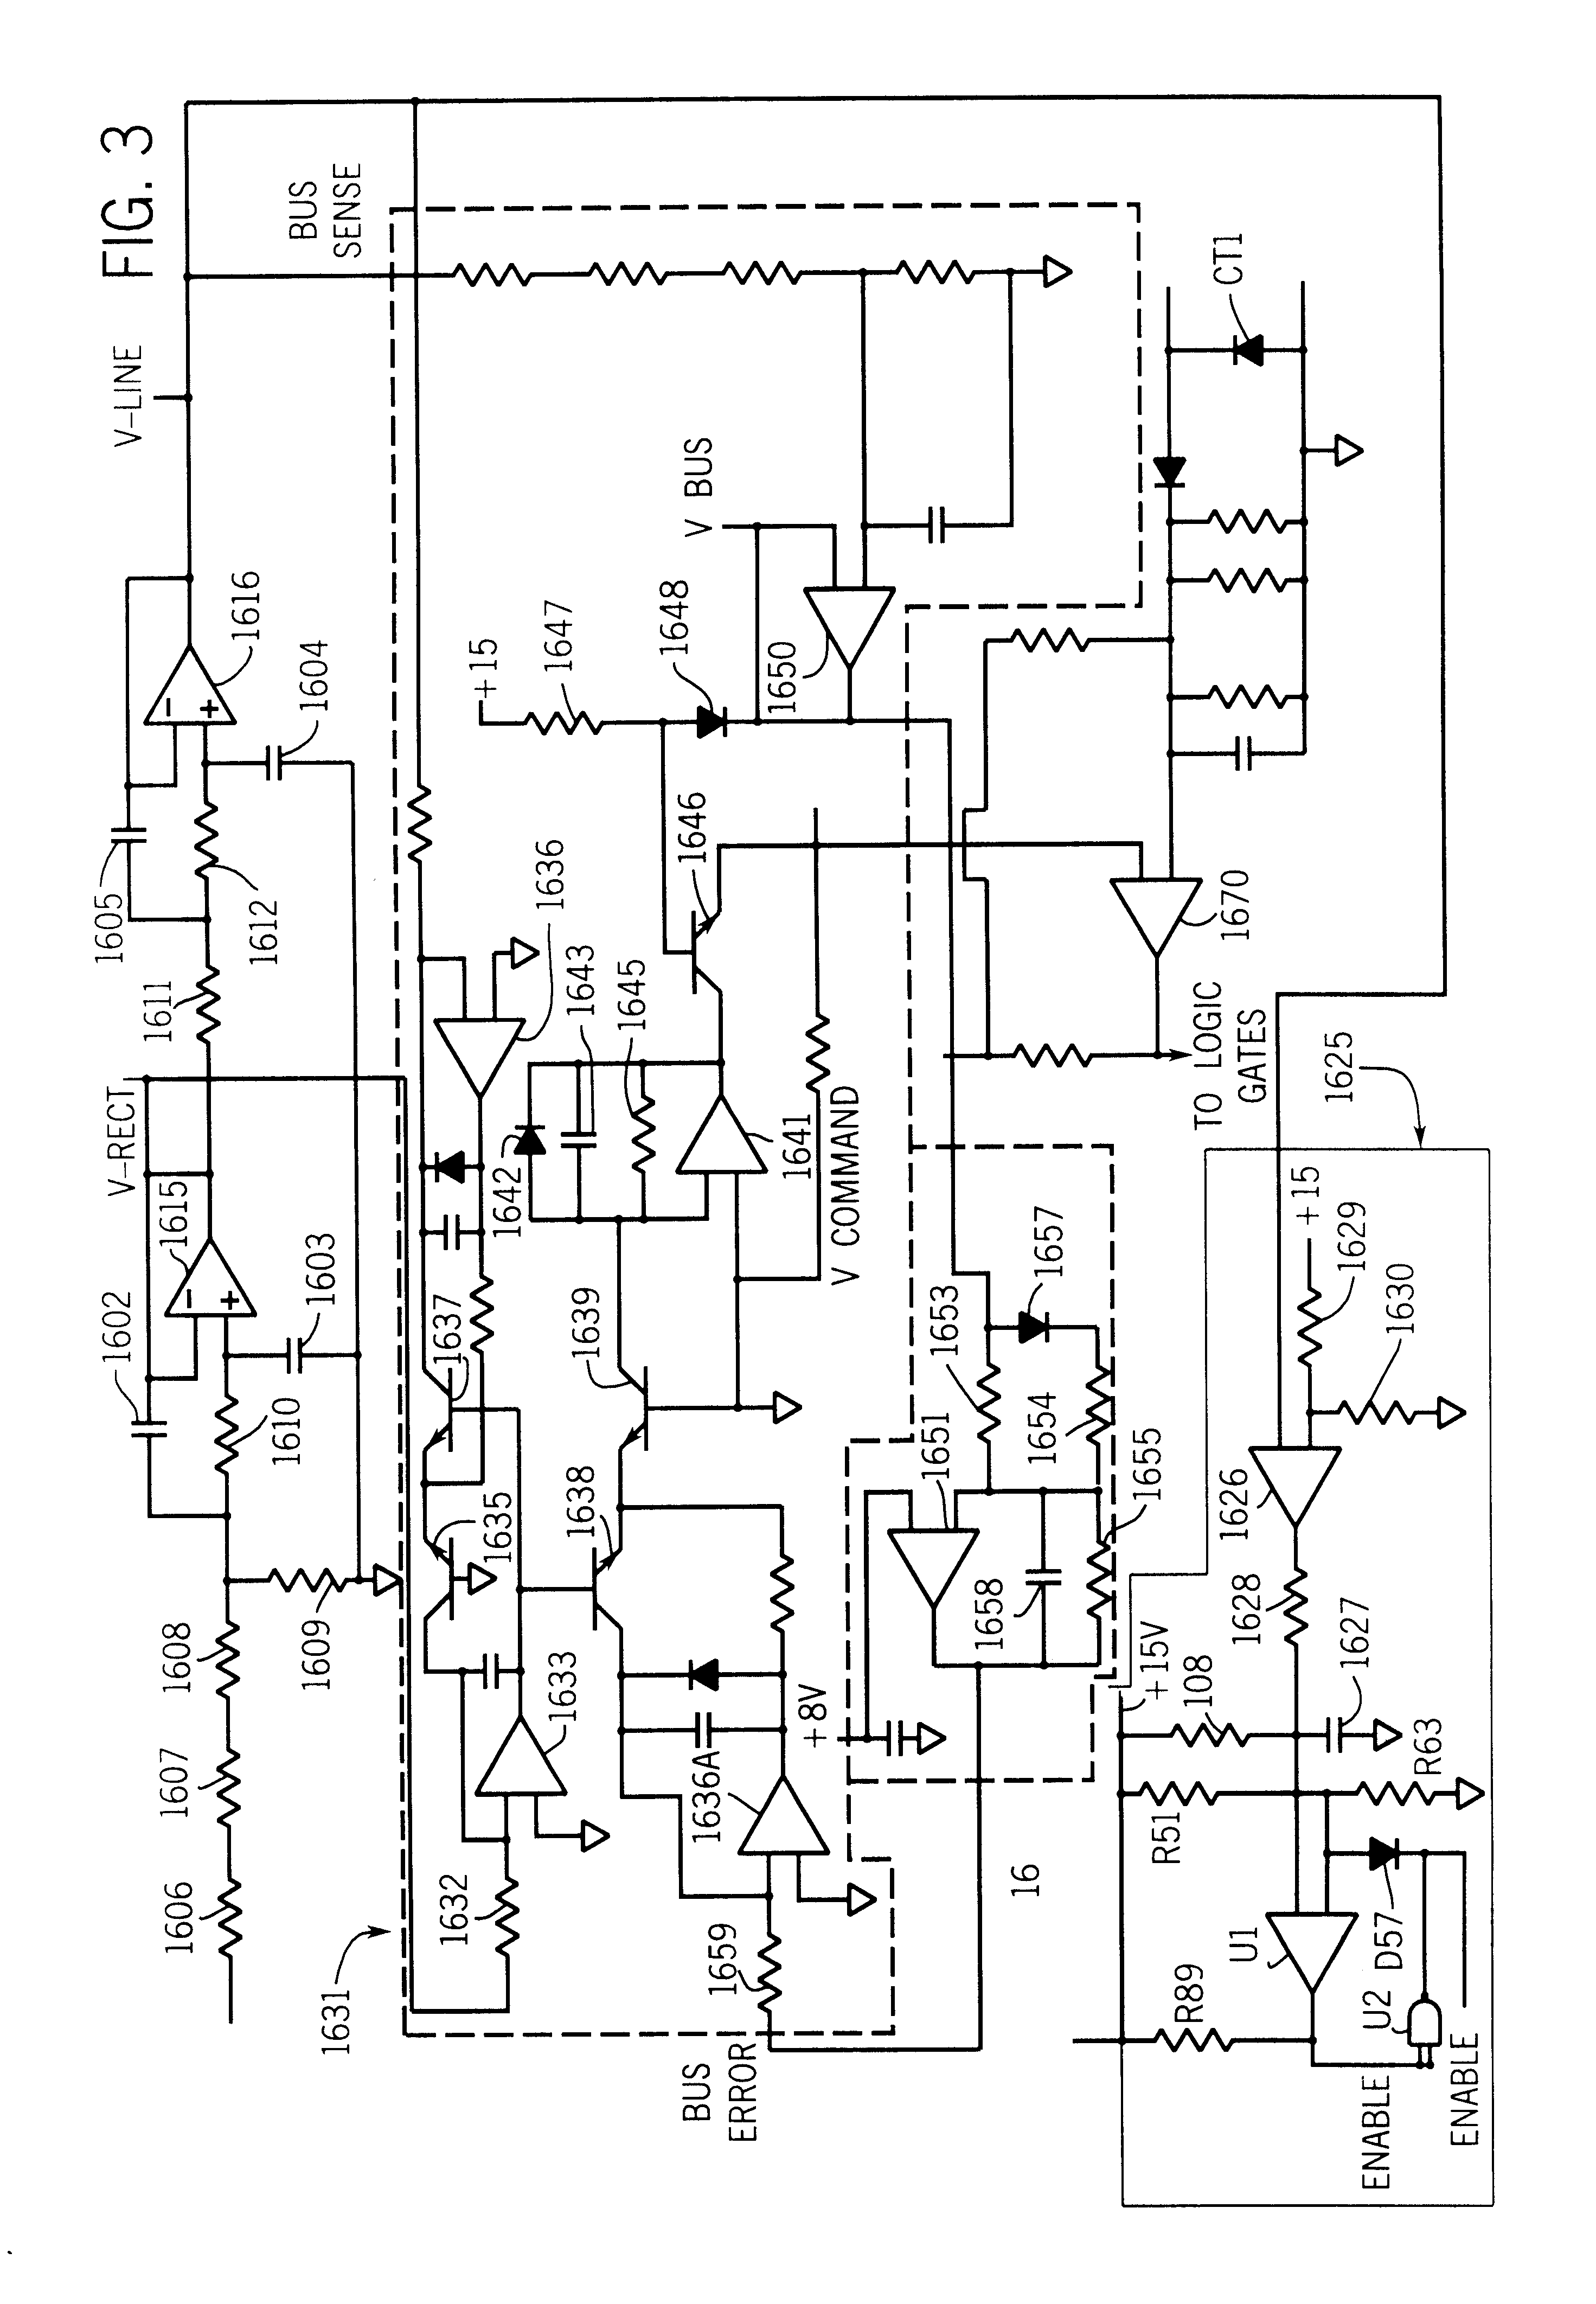 240 Volt Motor Wiring Diagram - Wiring Diagrams Database